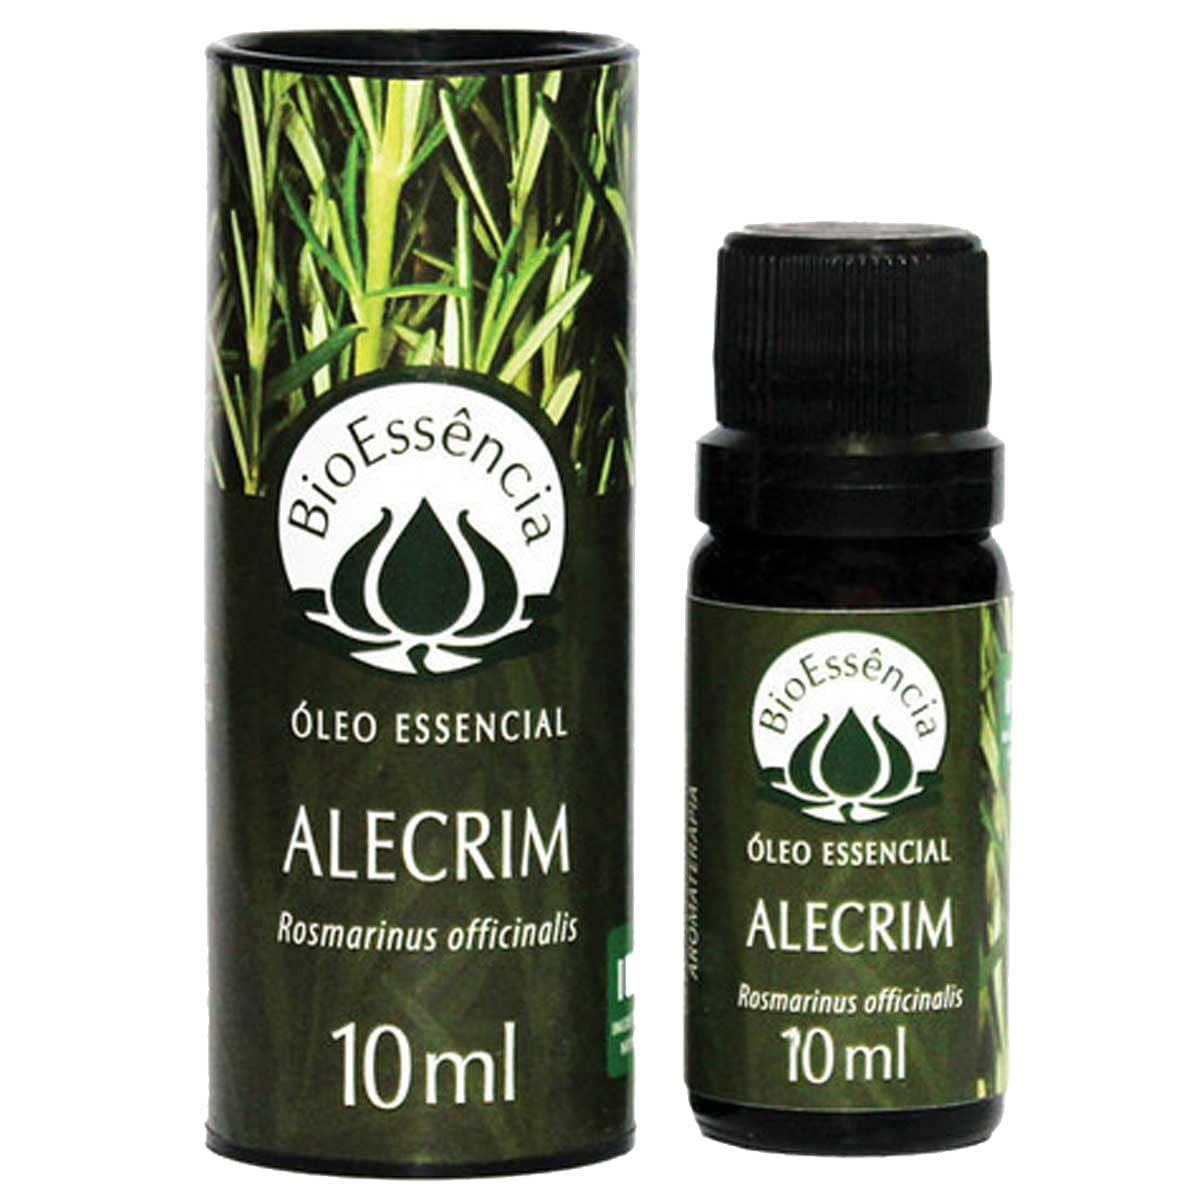 Óleo essencial alecrim 10 ml - bioessência